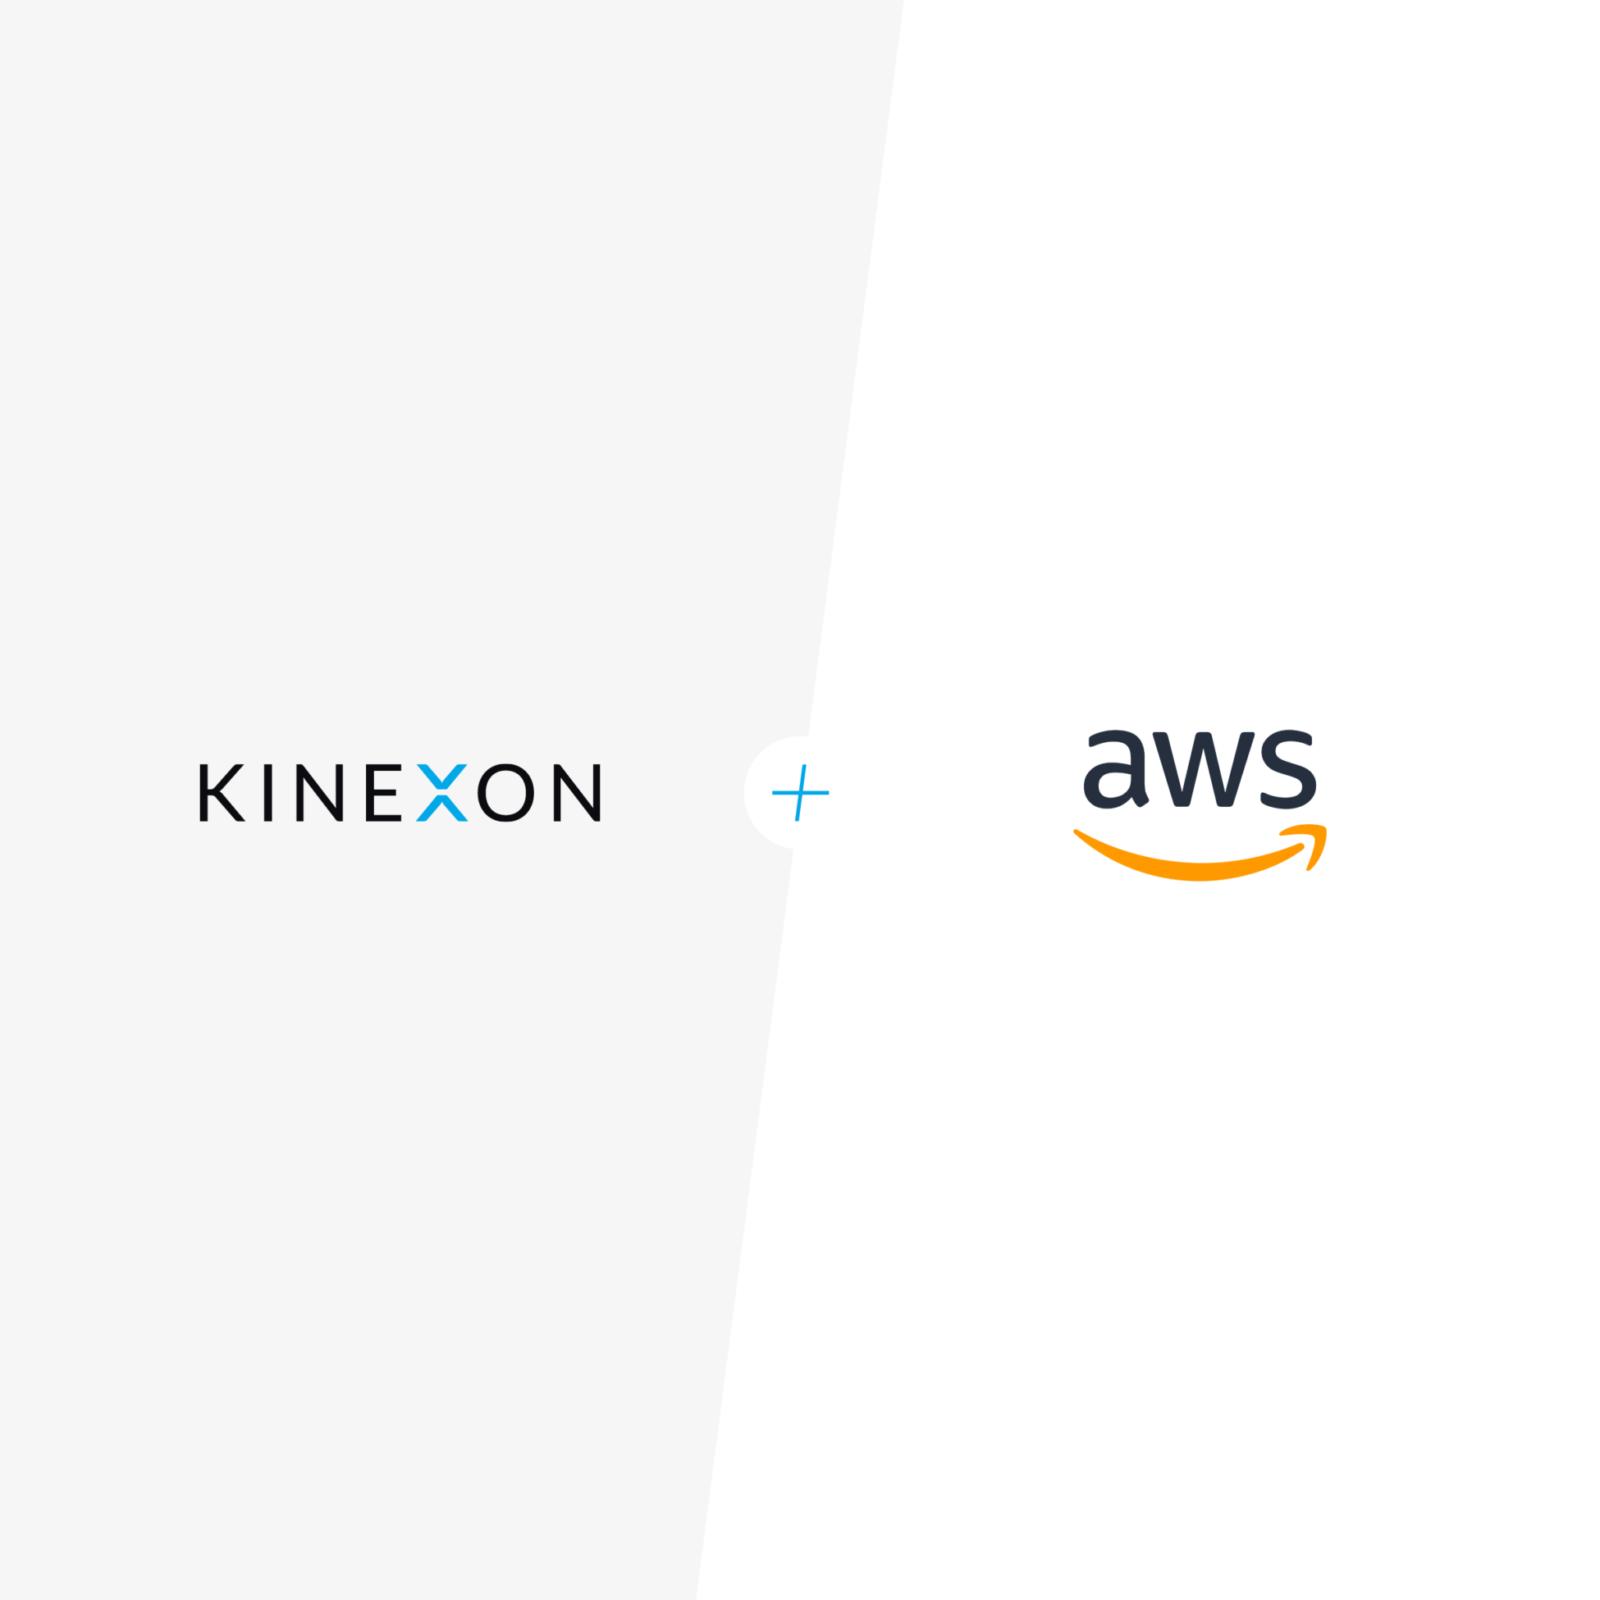 KINEXON X AWS website